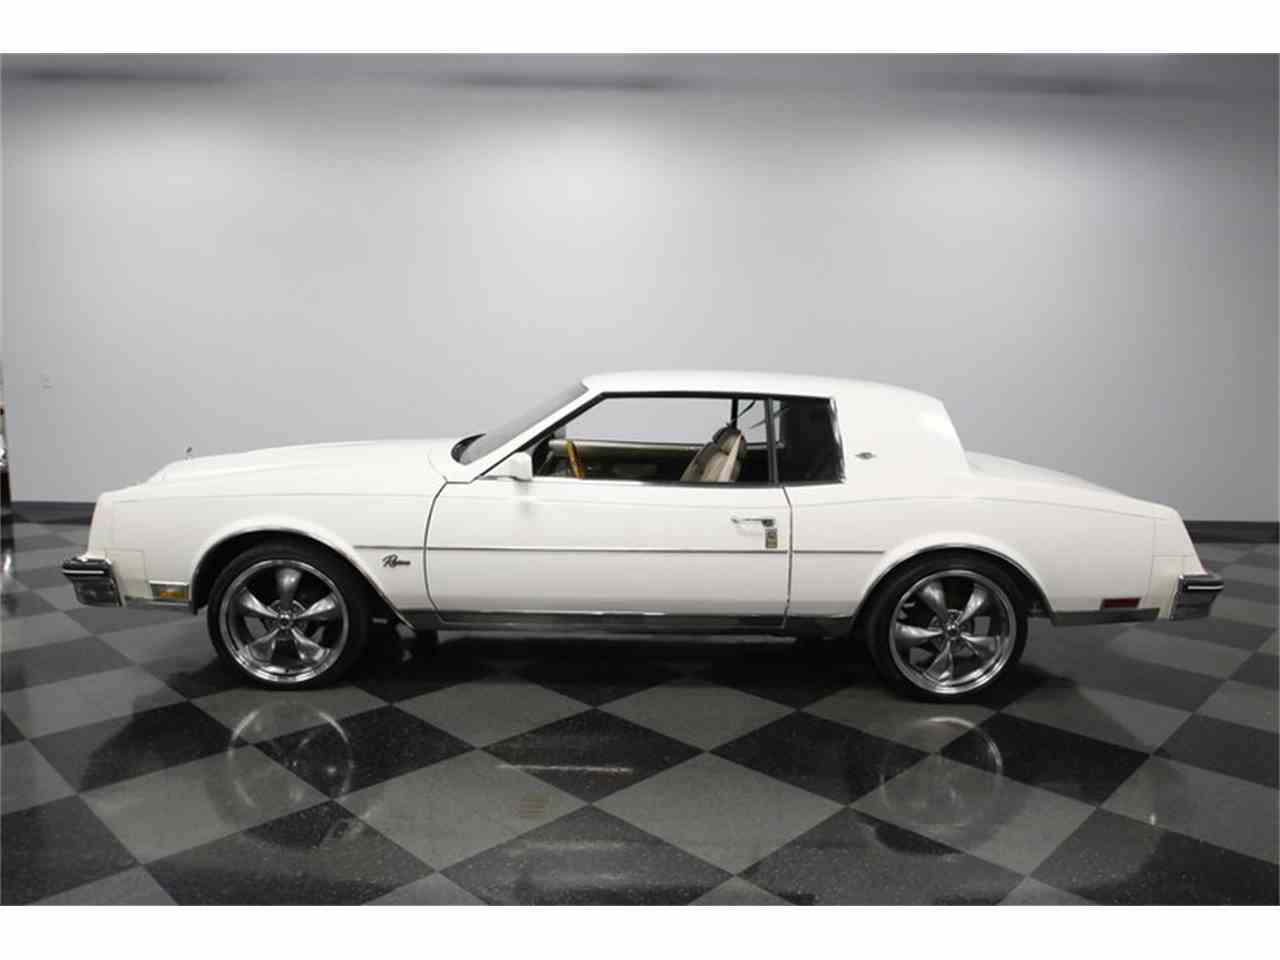 Large Picture of 1985 Buick Riviera located in Concord North Carolina - $8,995.00 - MEQO